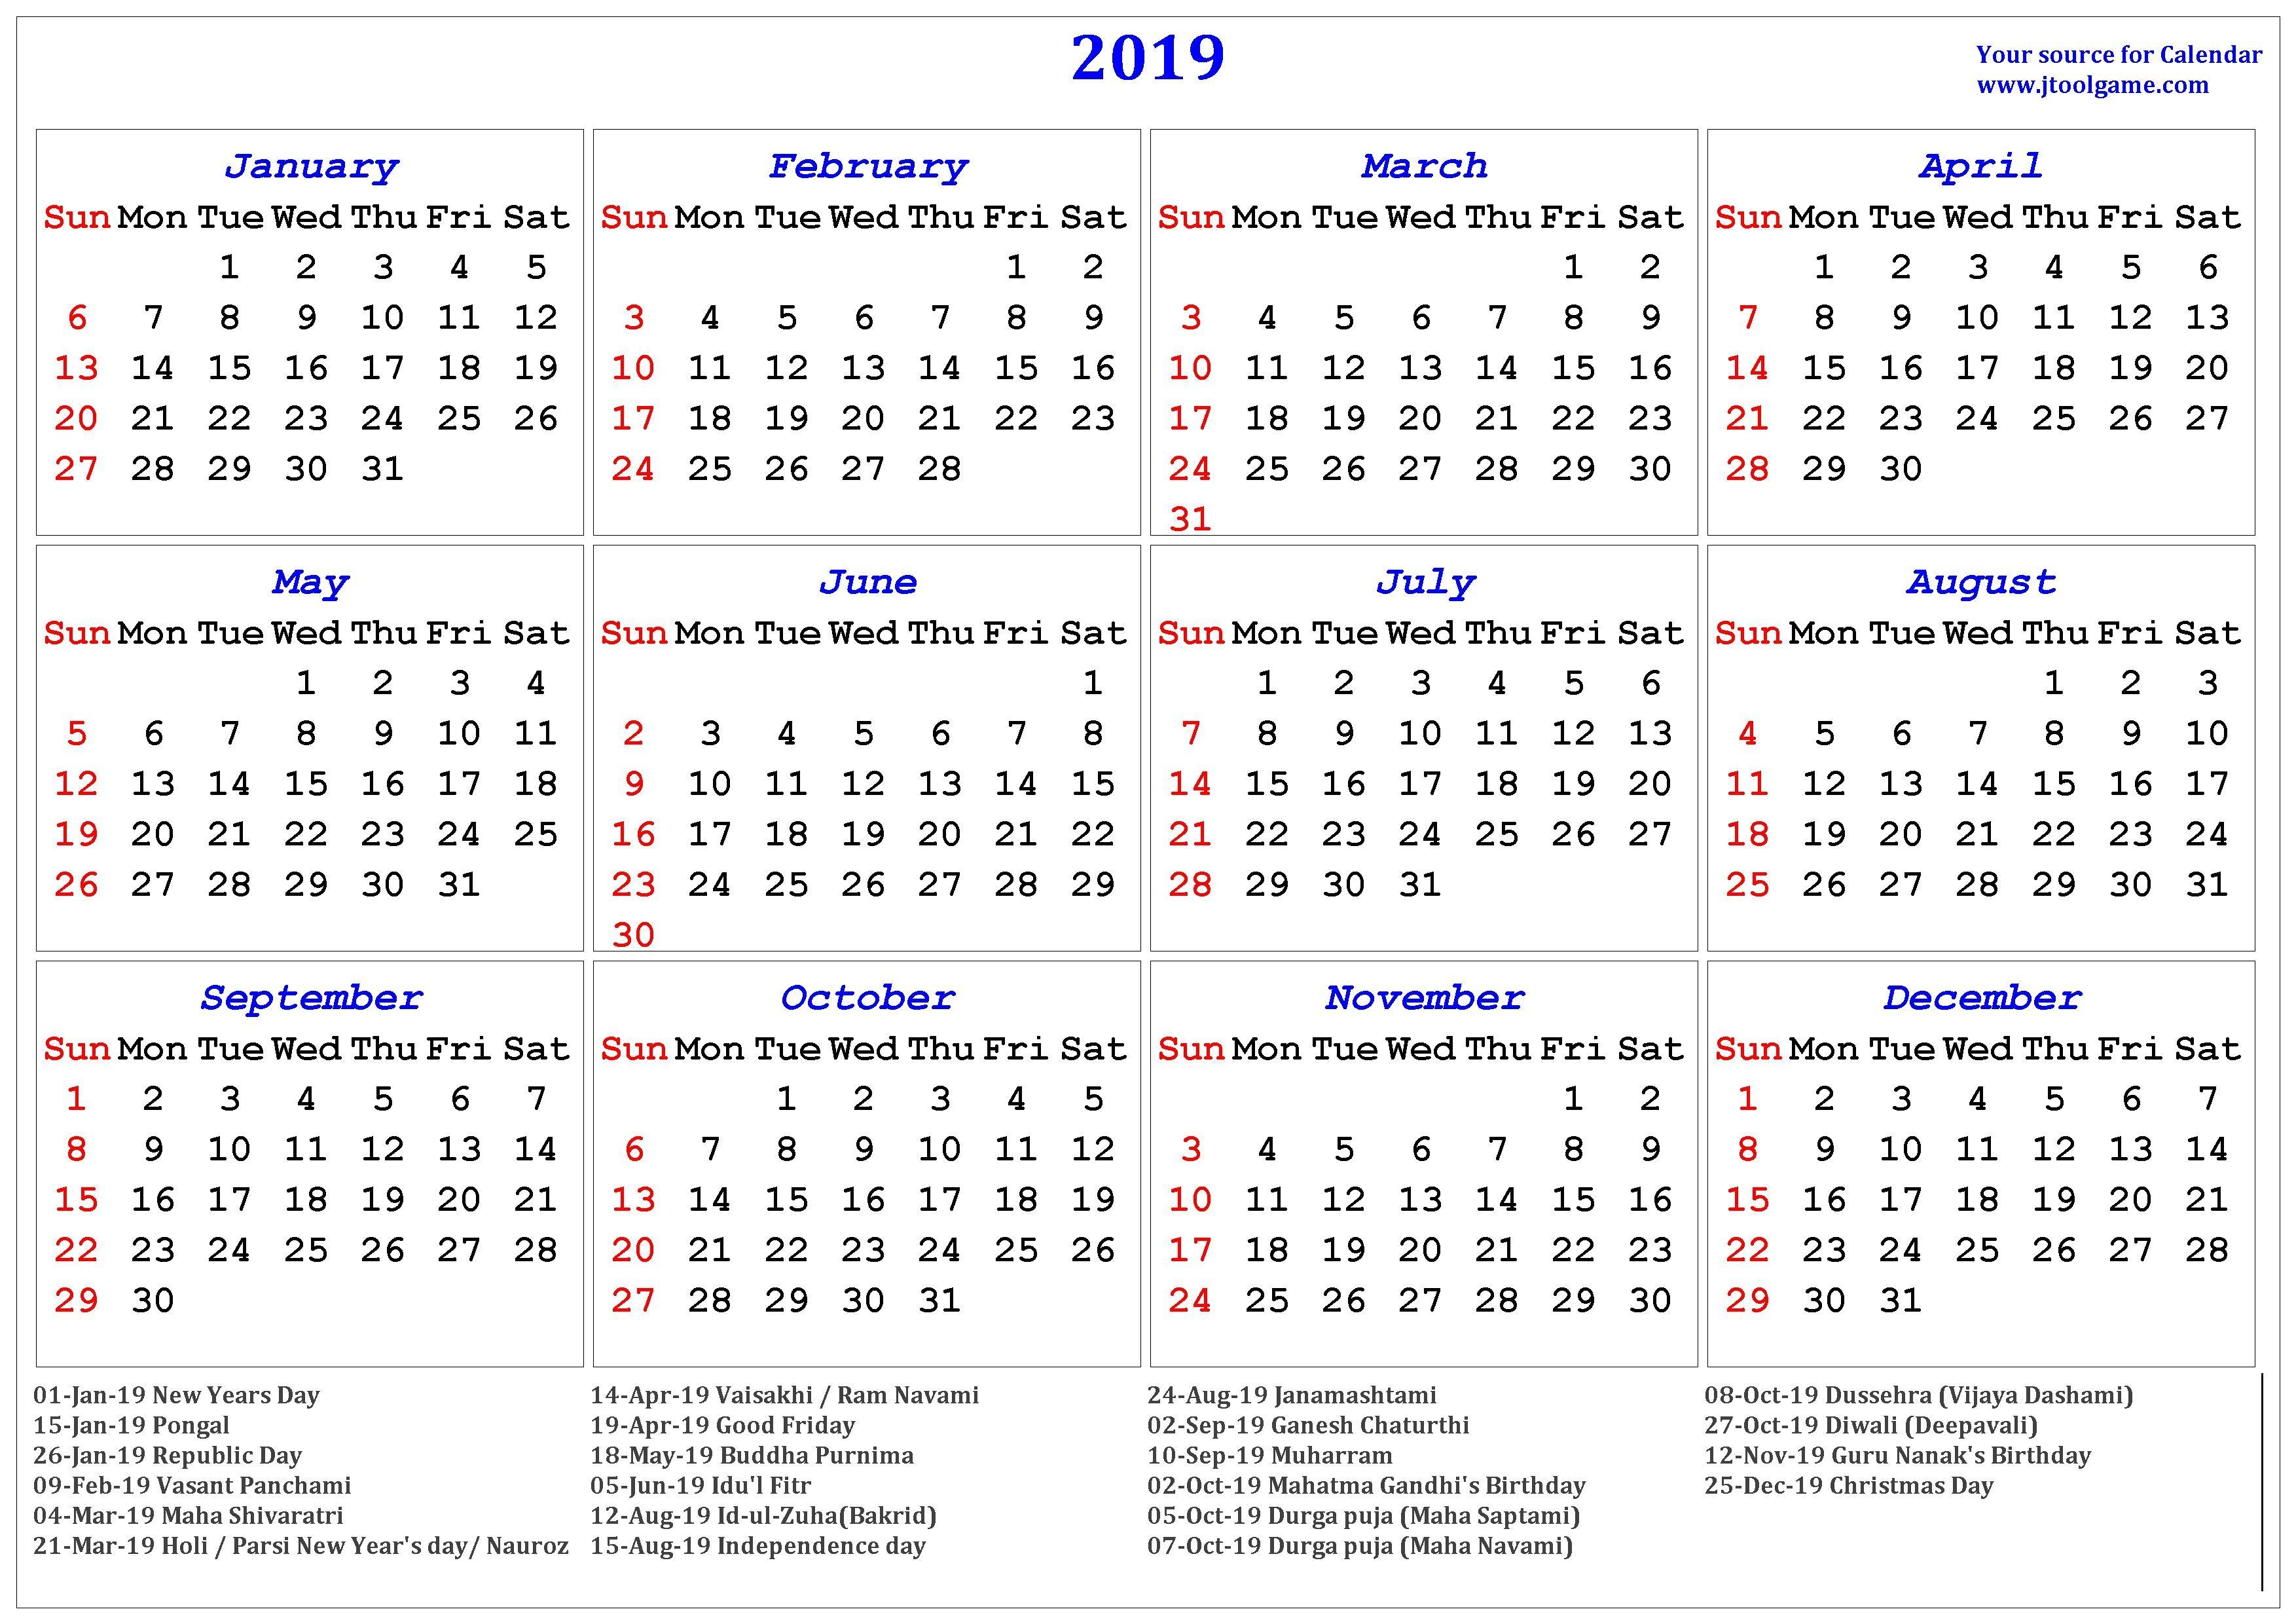 2019 Calendar Holidays India